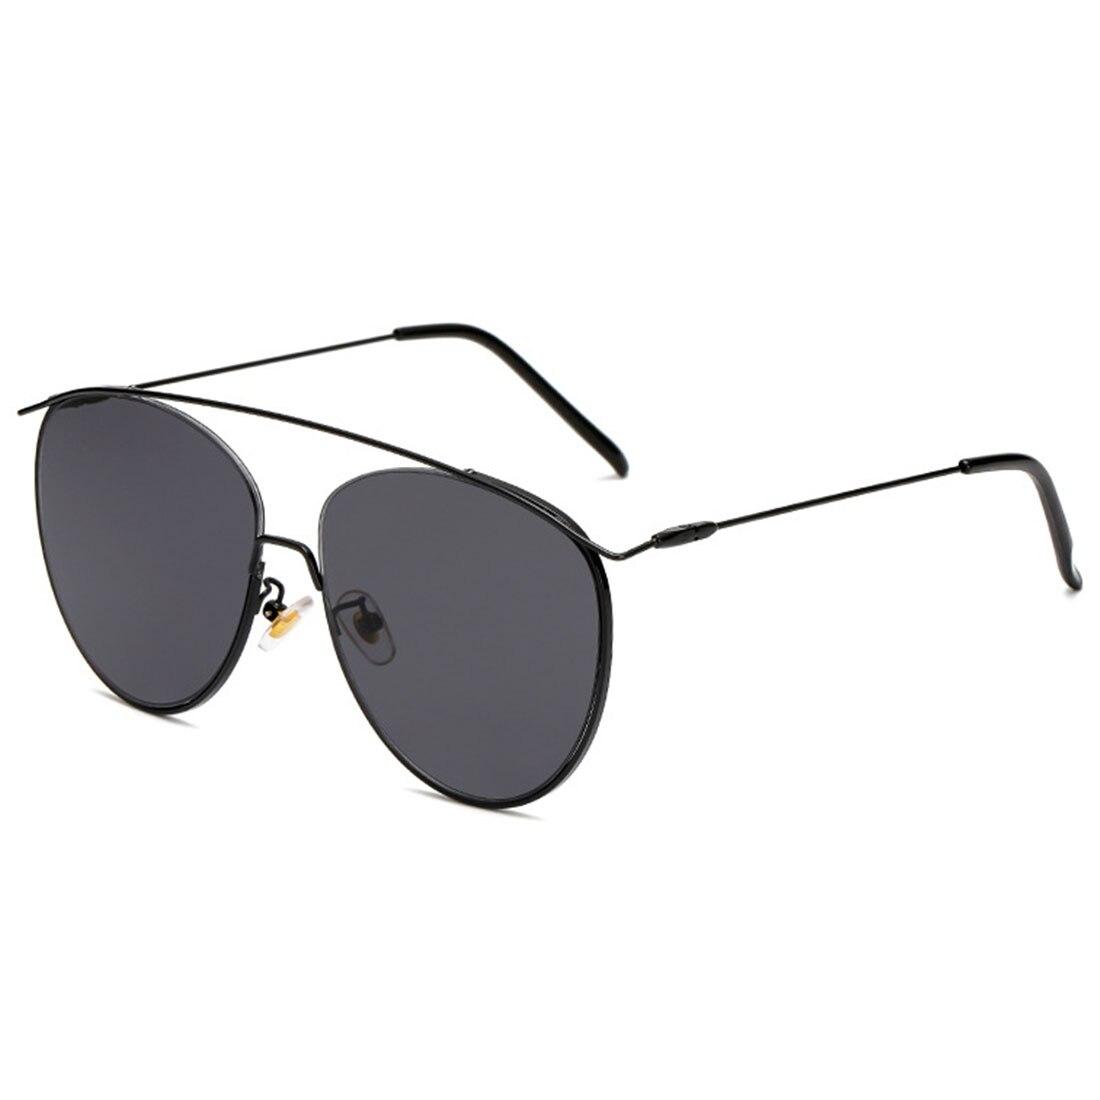 Sunglasses Men Polarized Brand Classic Metal Pilot Glasses For Women Brown Lens Fashion Style UV400 Gafas De Sol in Women 39 s Sunglasses from Apparel Accessories